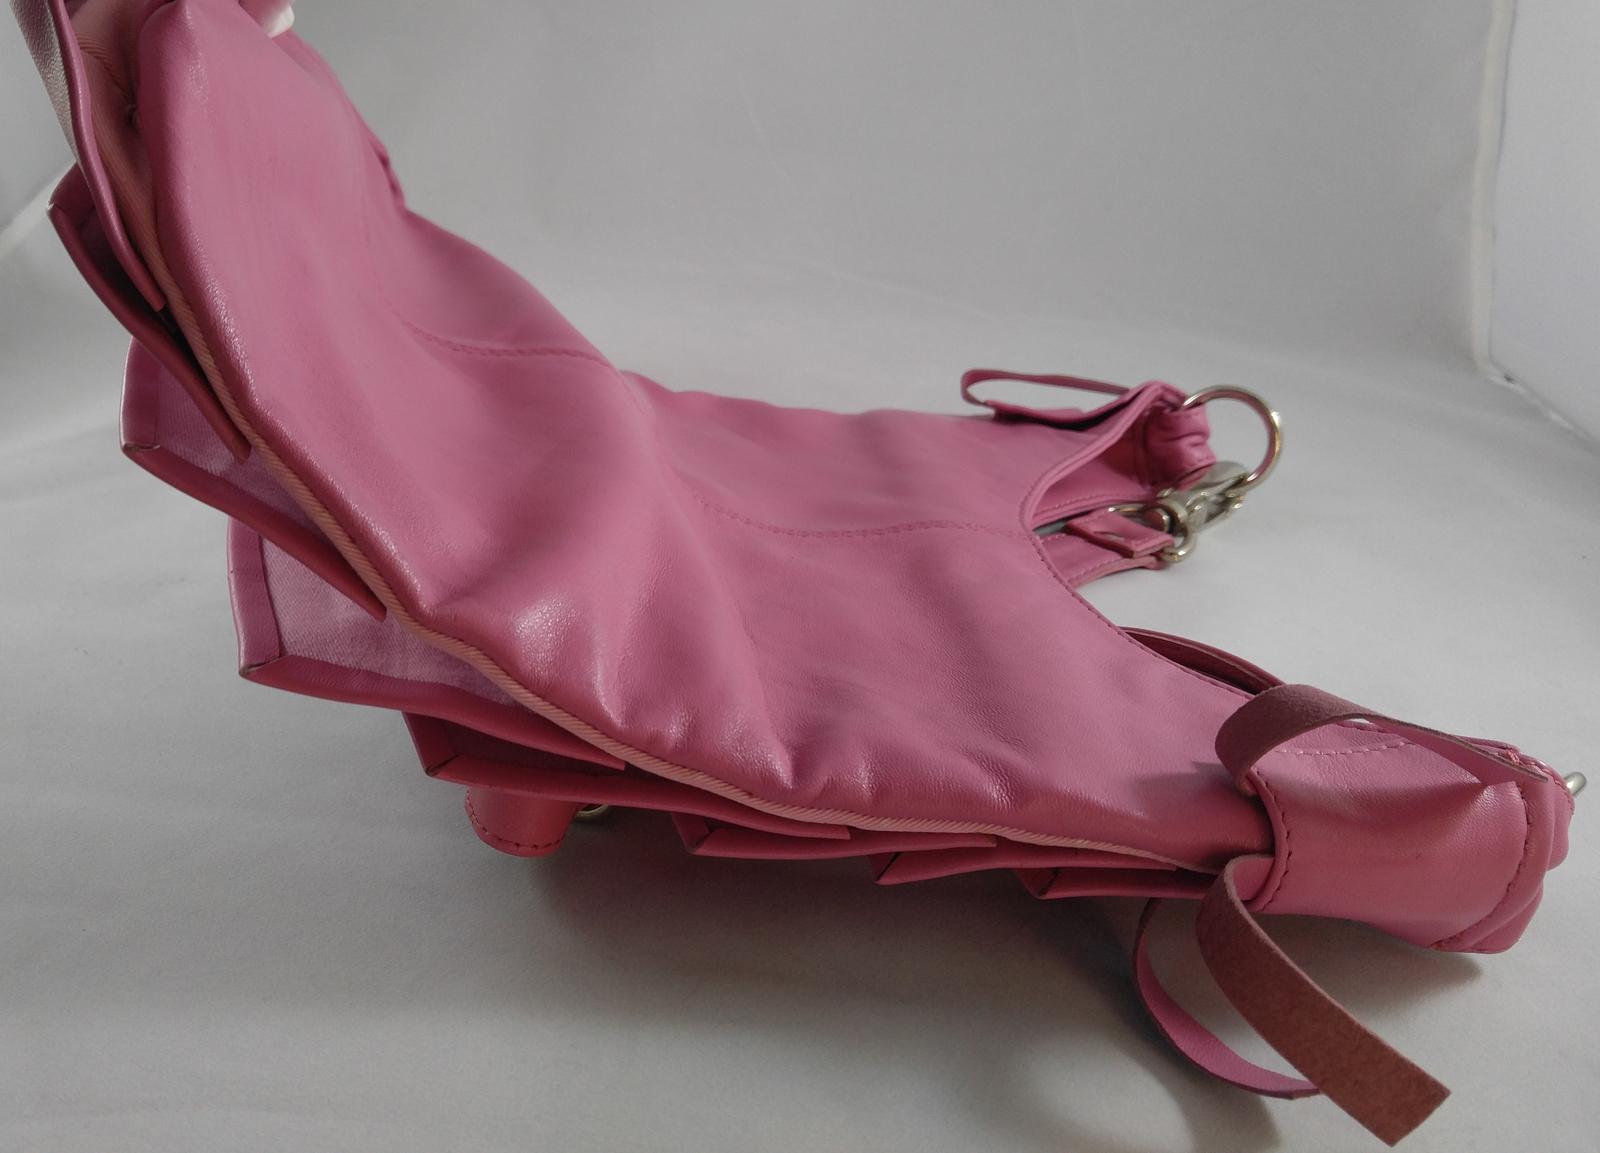 Kyss Handbags Designer Krista Orr Pink Shoulder Strap Purse Plymouth, Michigan image 4